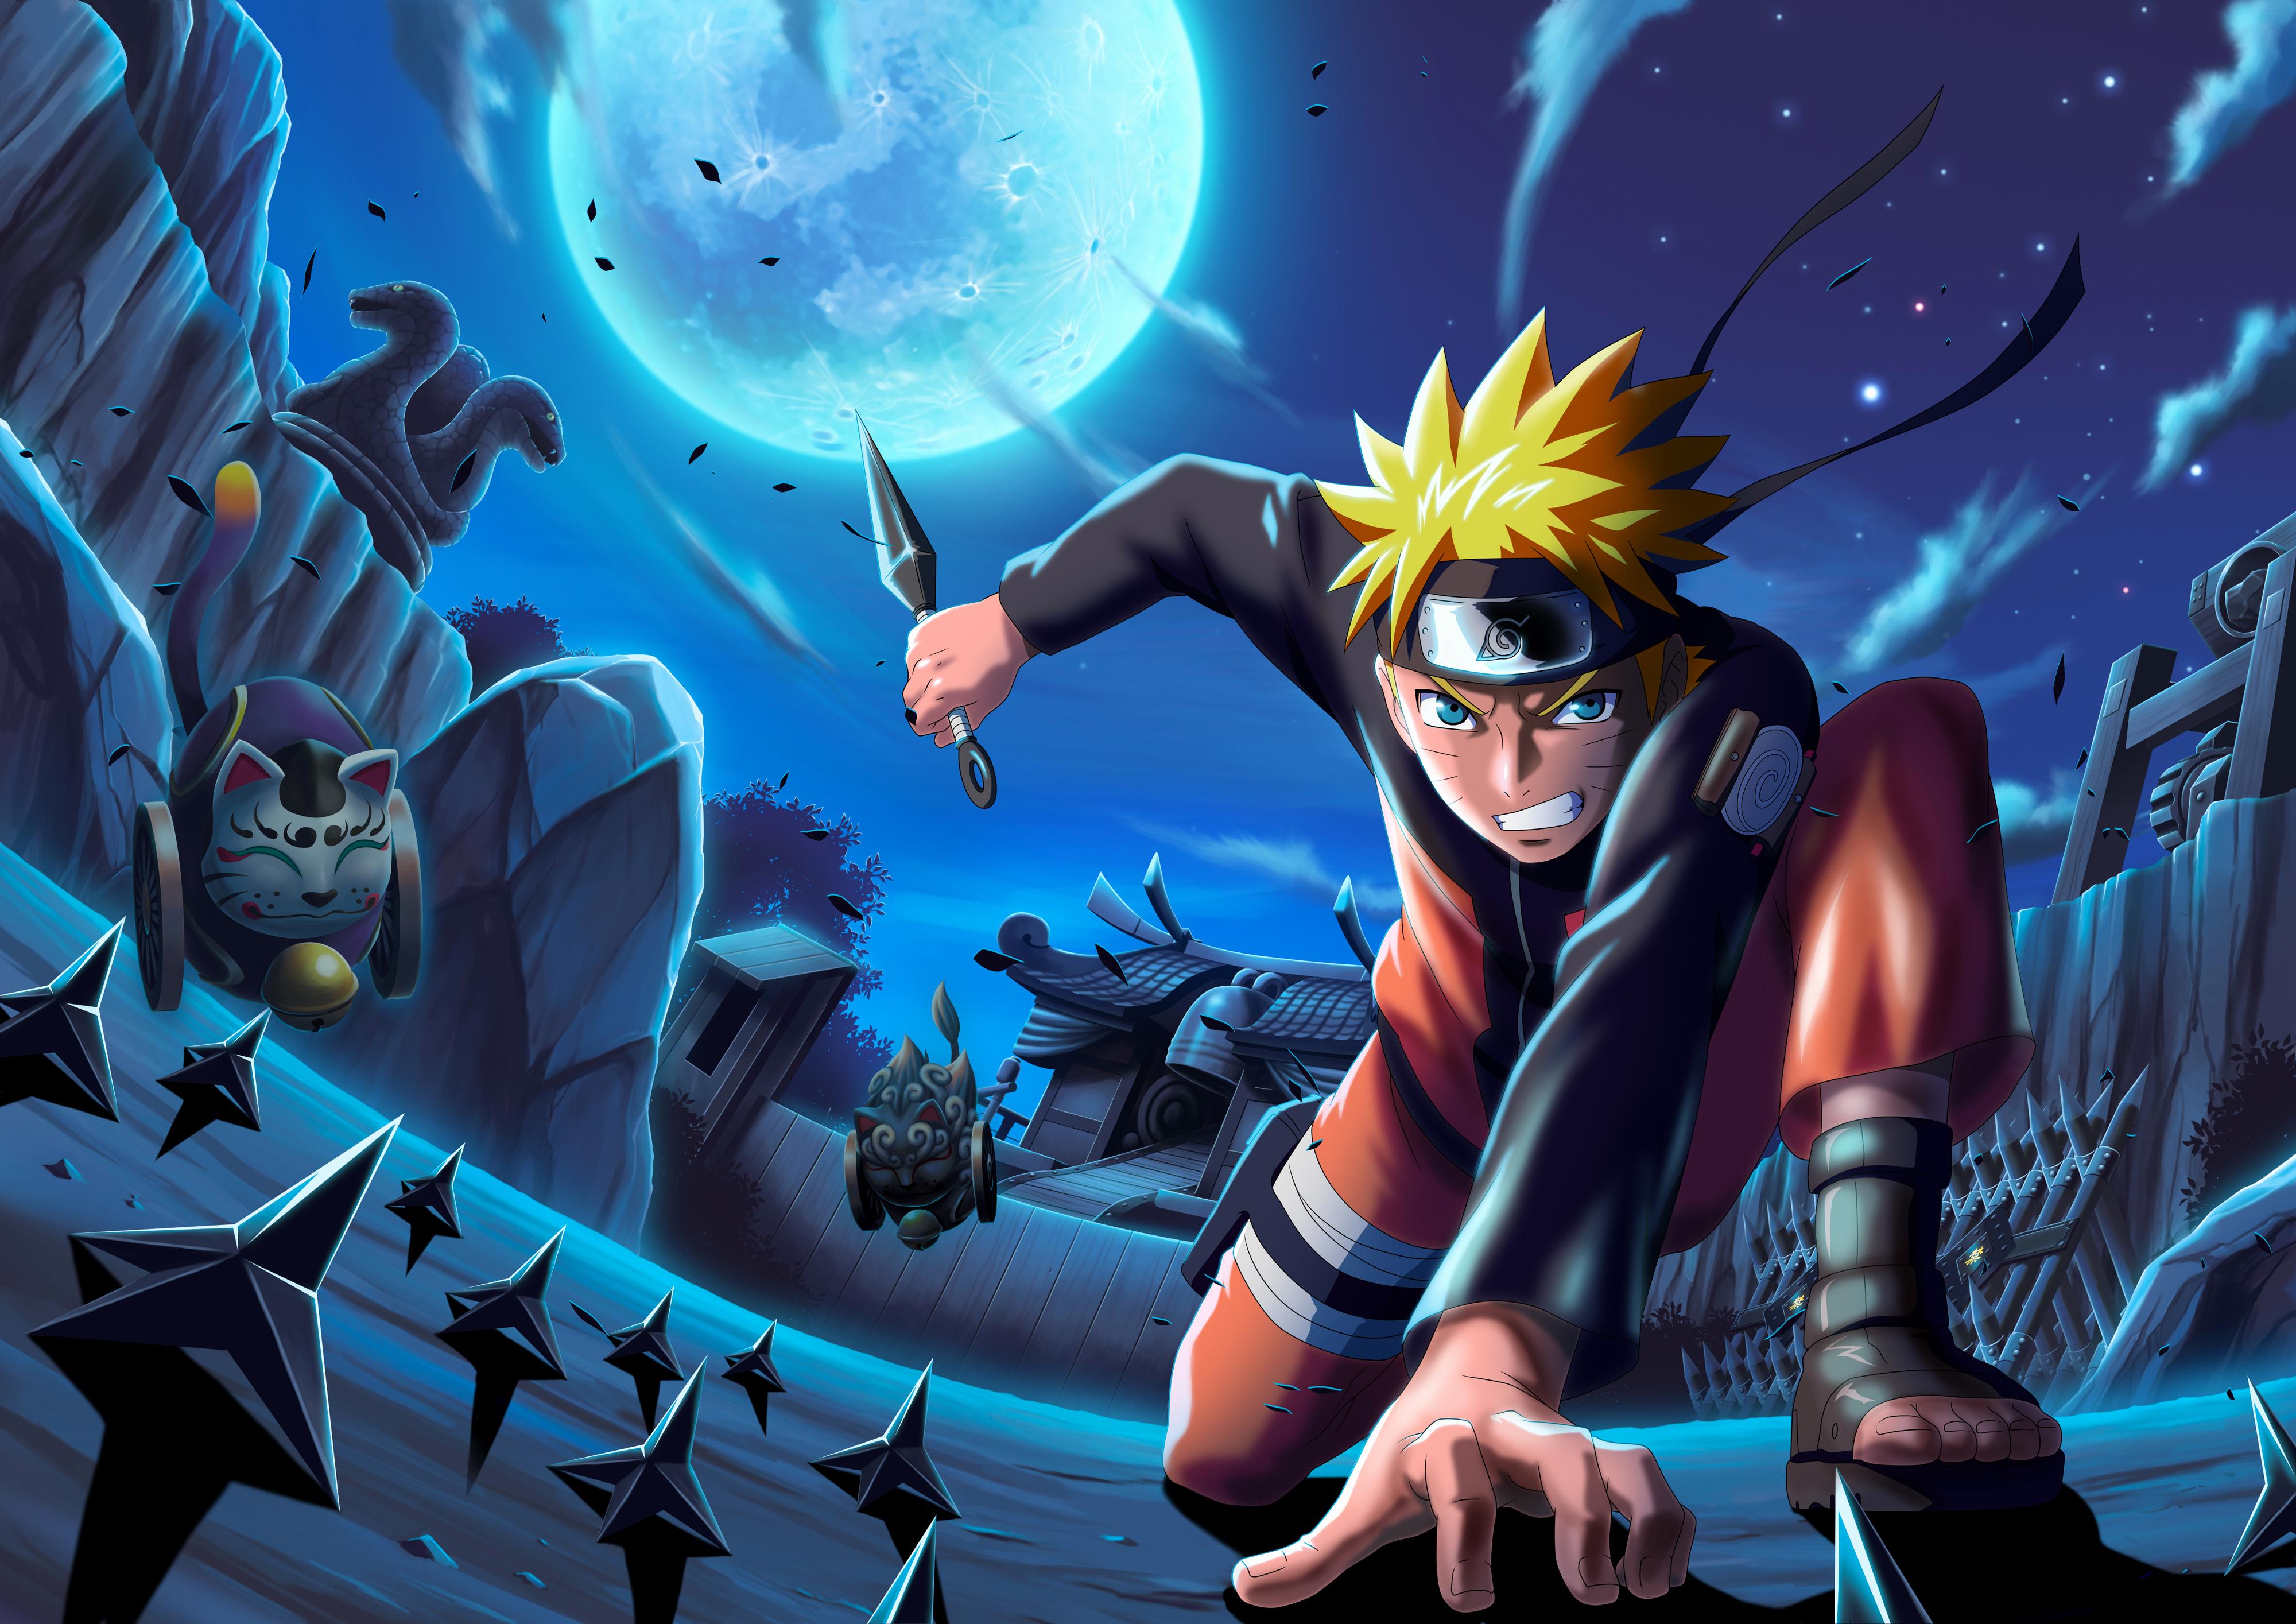 3840x2160 anime wallpapers for 4k devices. Naruto X Boruto Ninja Voltage, HD Games, 4k Wallpapers ...